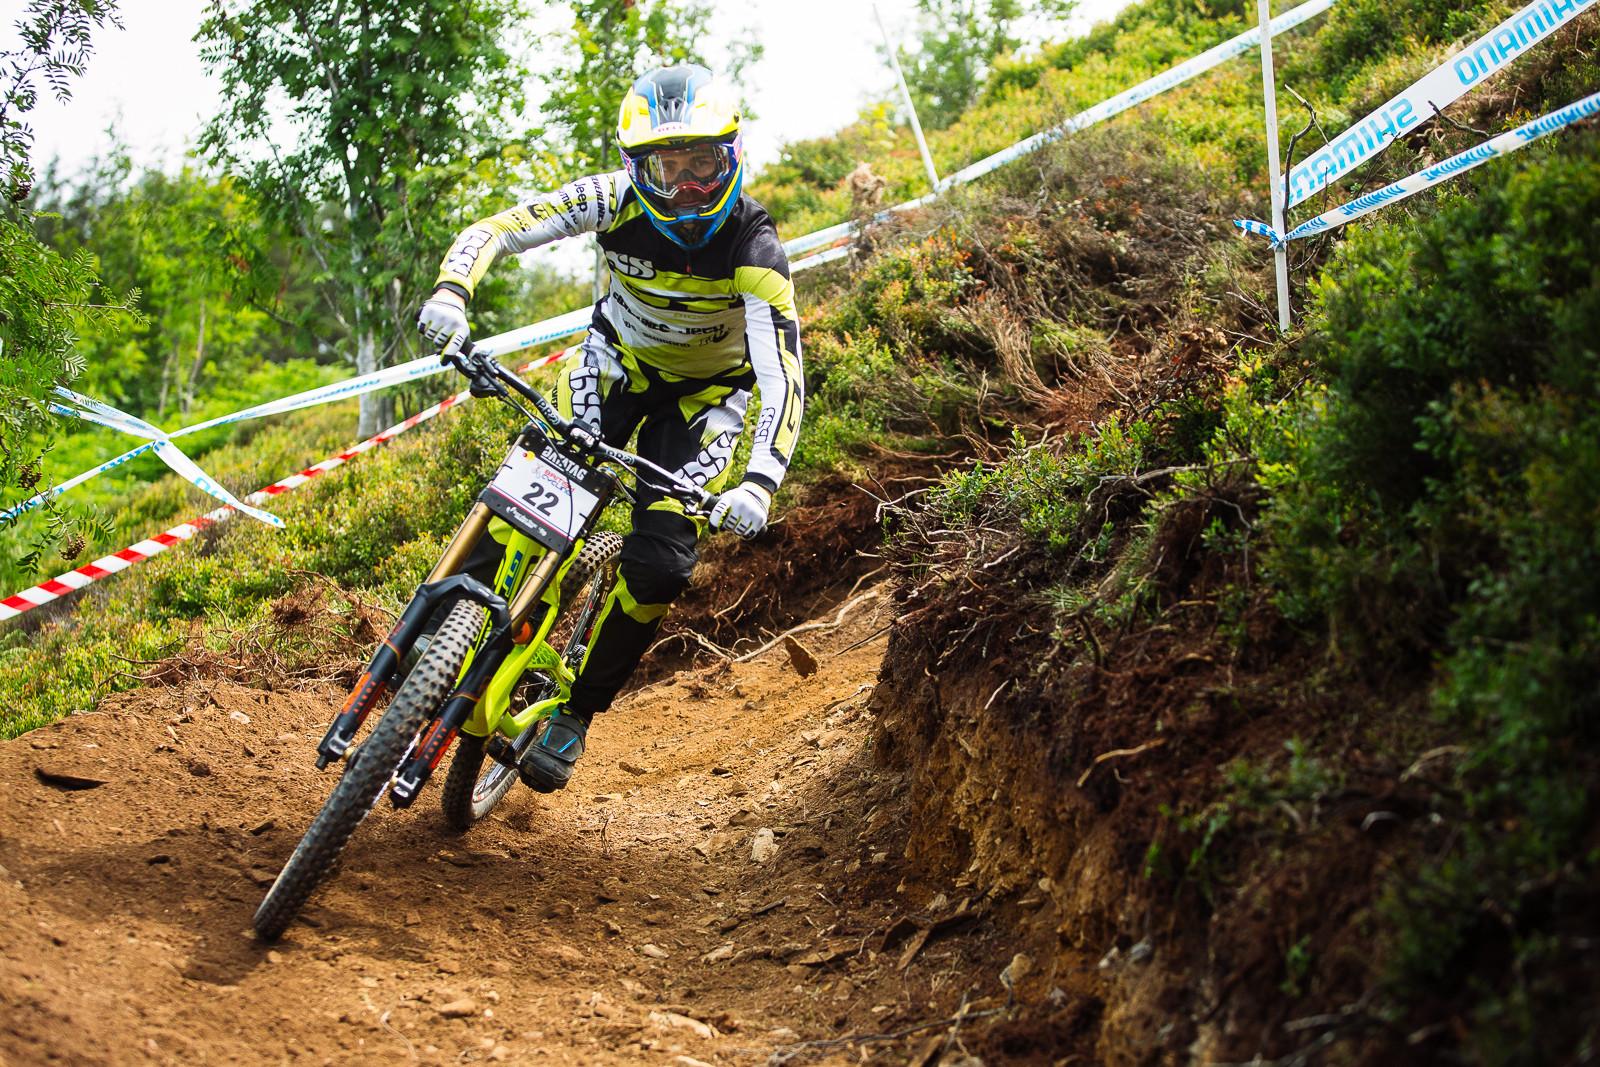 Taylor Vernon - 2015 British National Champs Downhill - 2015 British National Champs Downhill Photos - Mountain Biking Pictures - Vital MTB